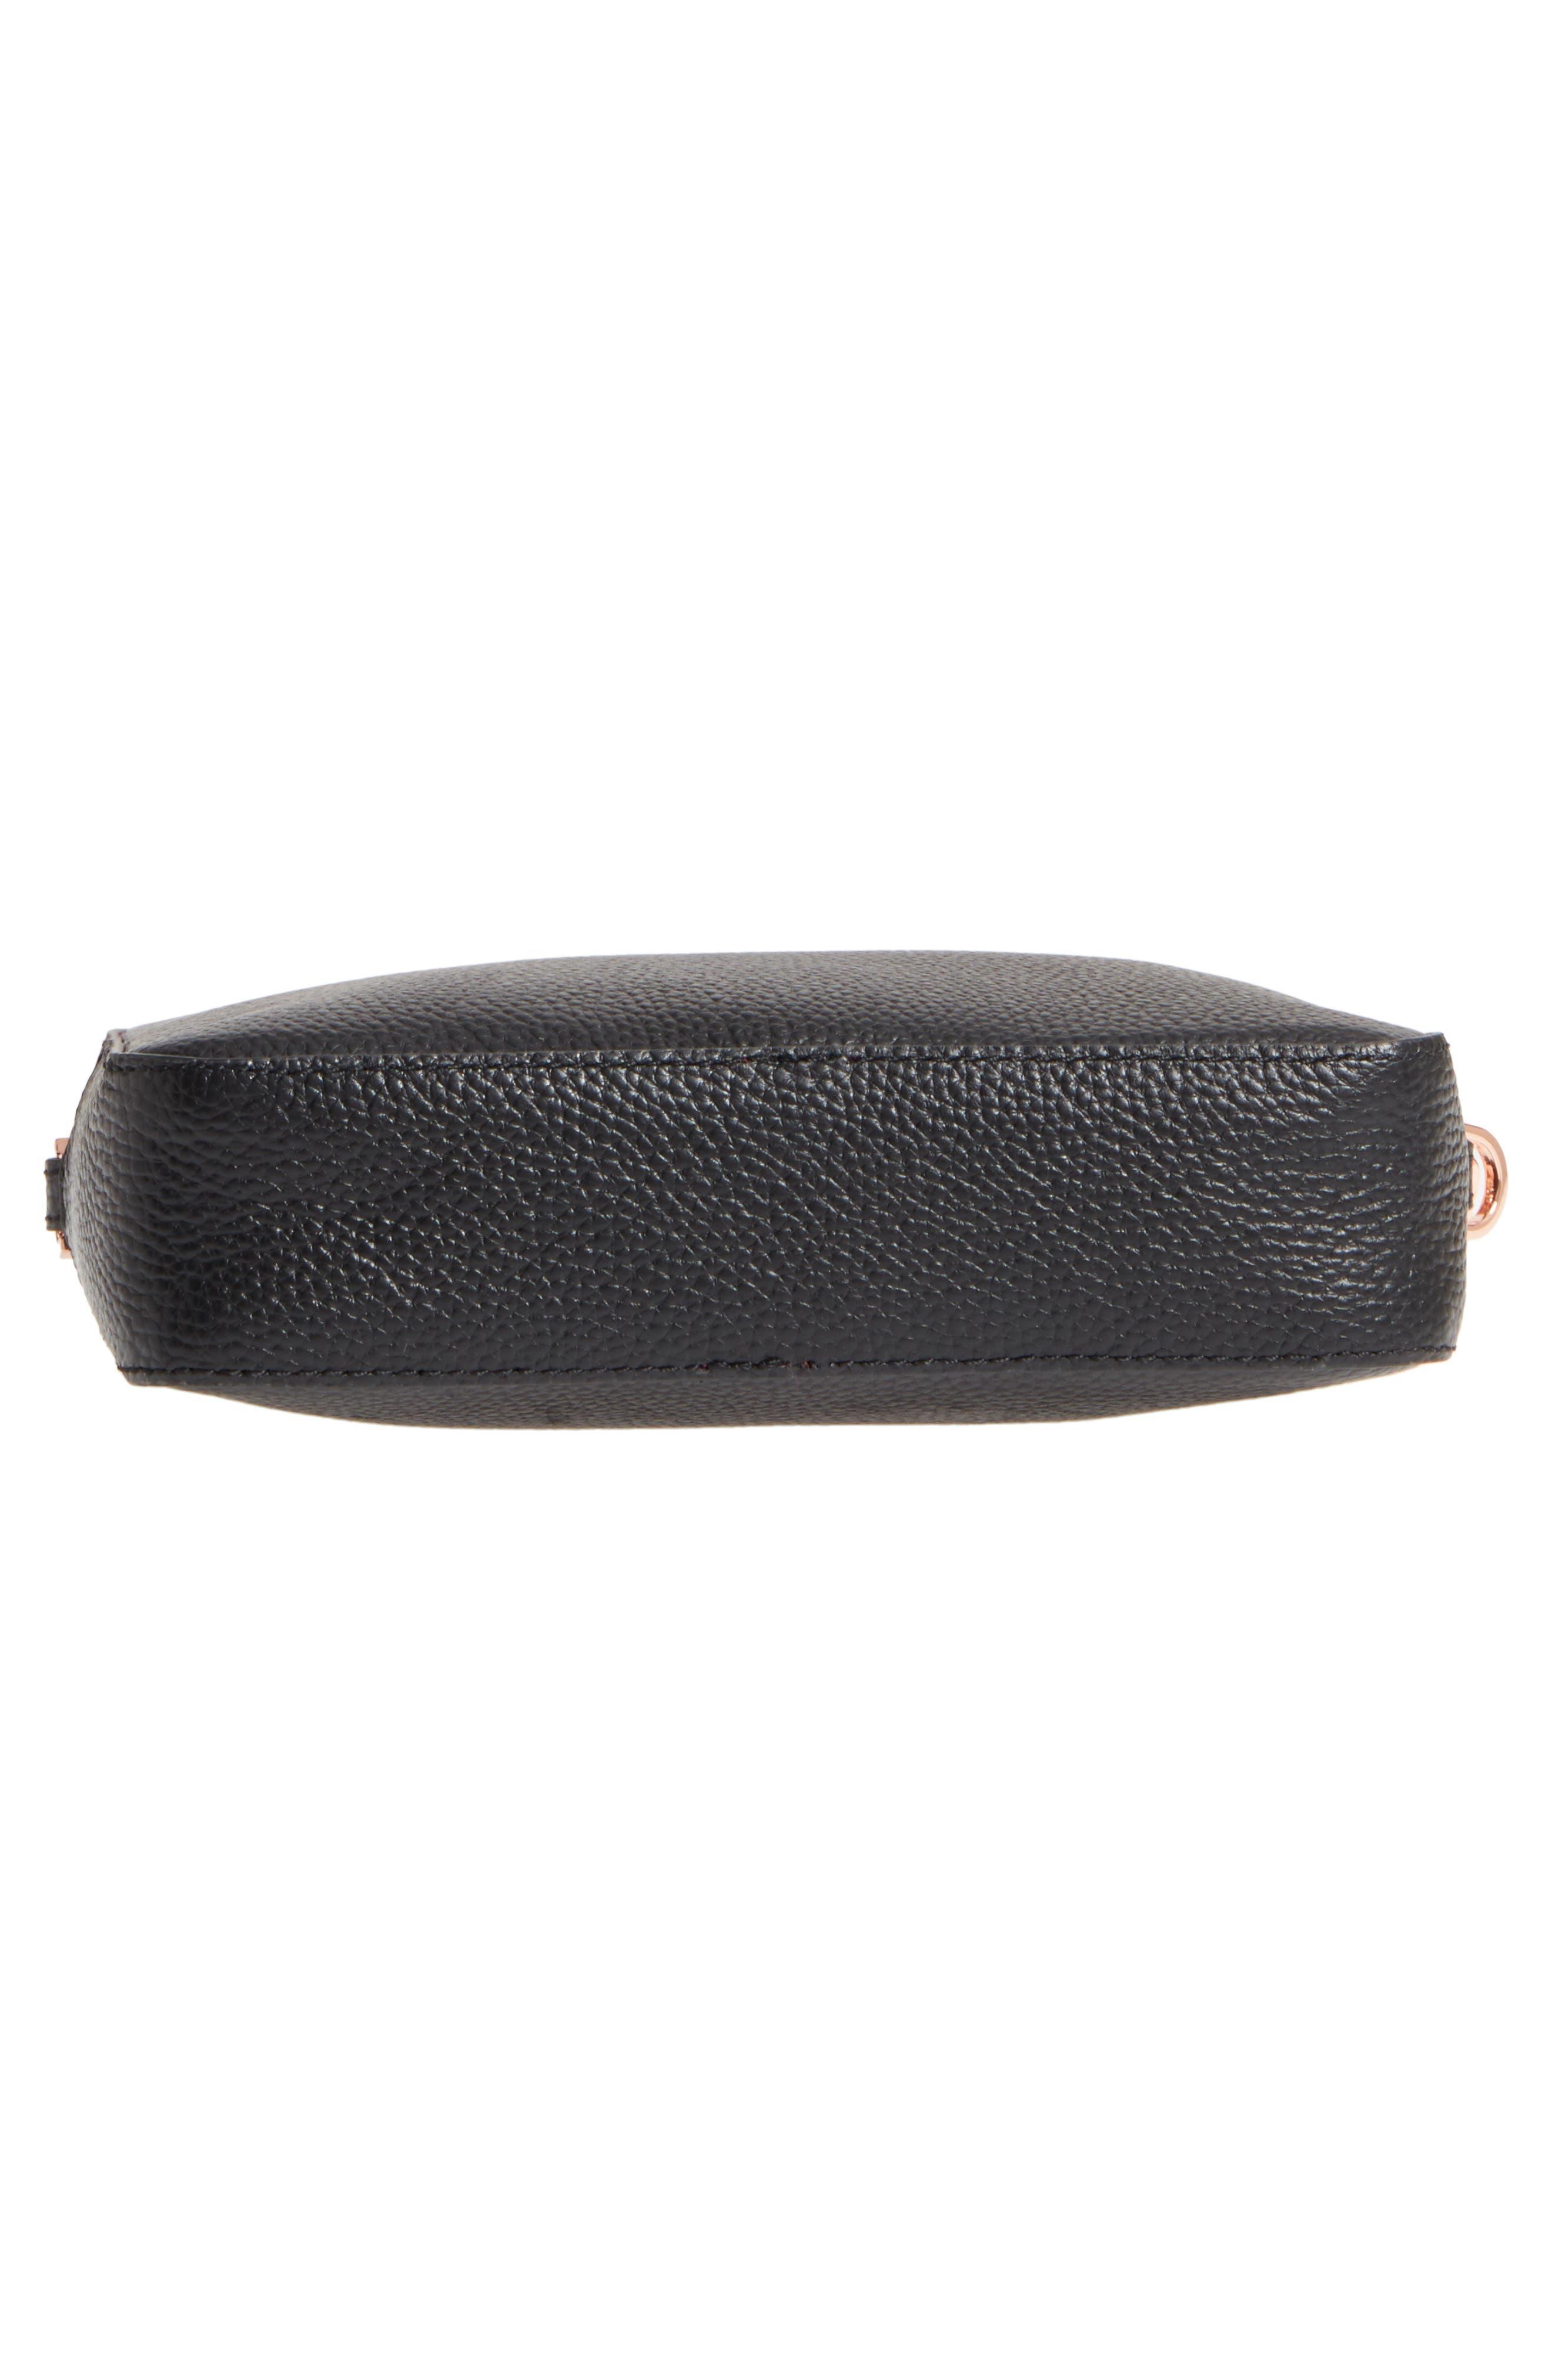 Susi Leather Crossbody Bag,                             Alternate thumbnail 6, color,                             001